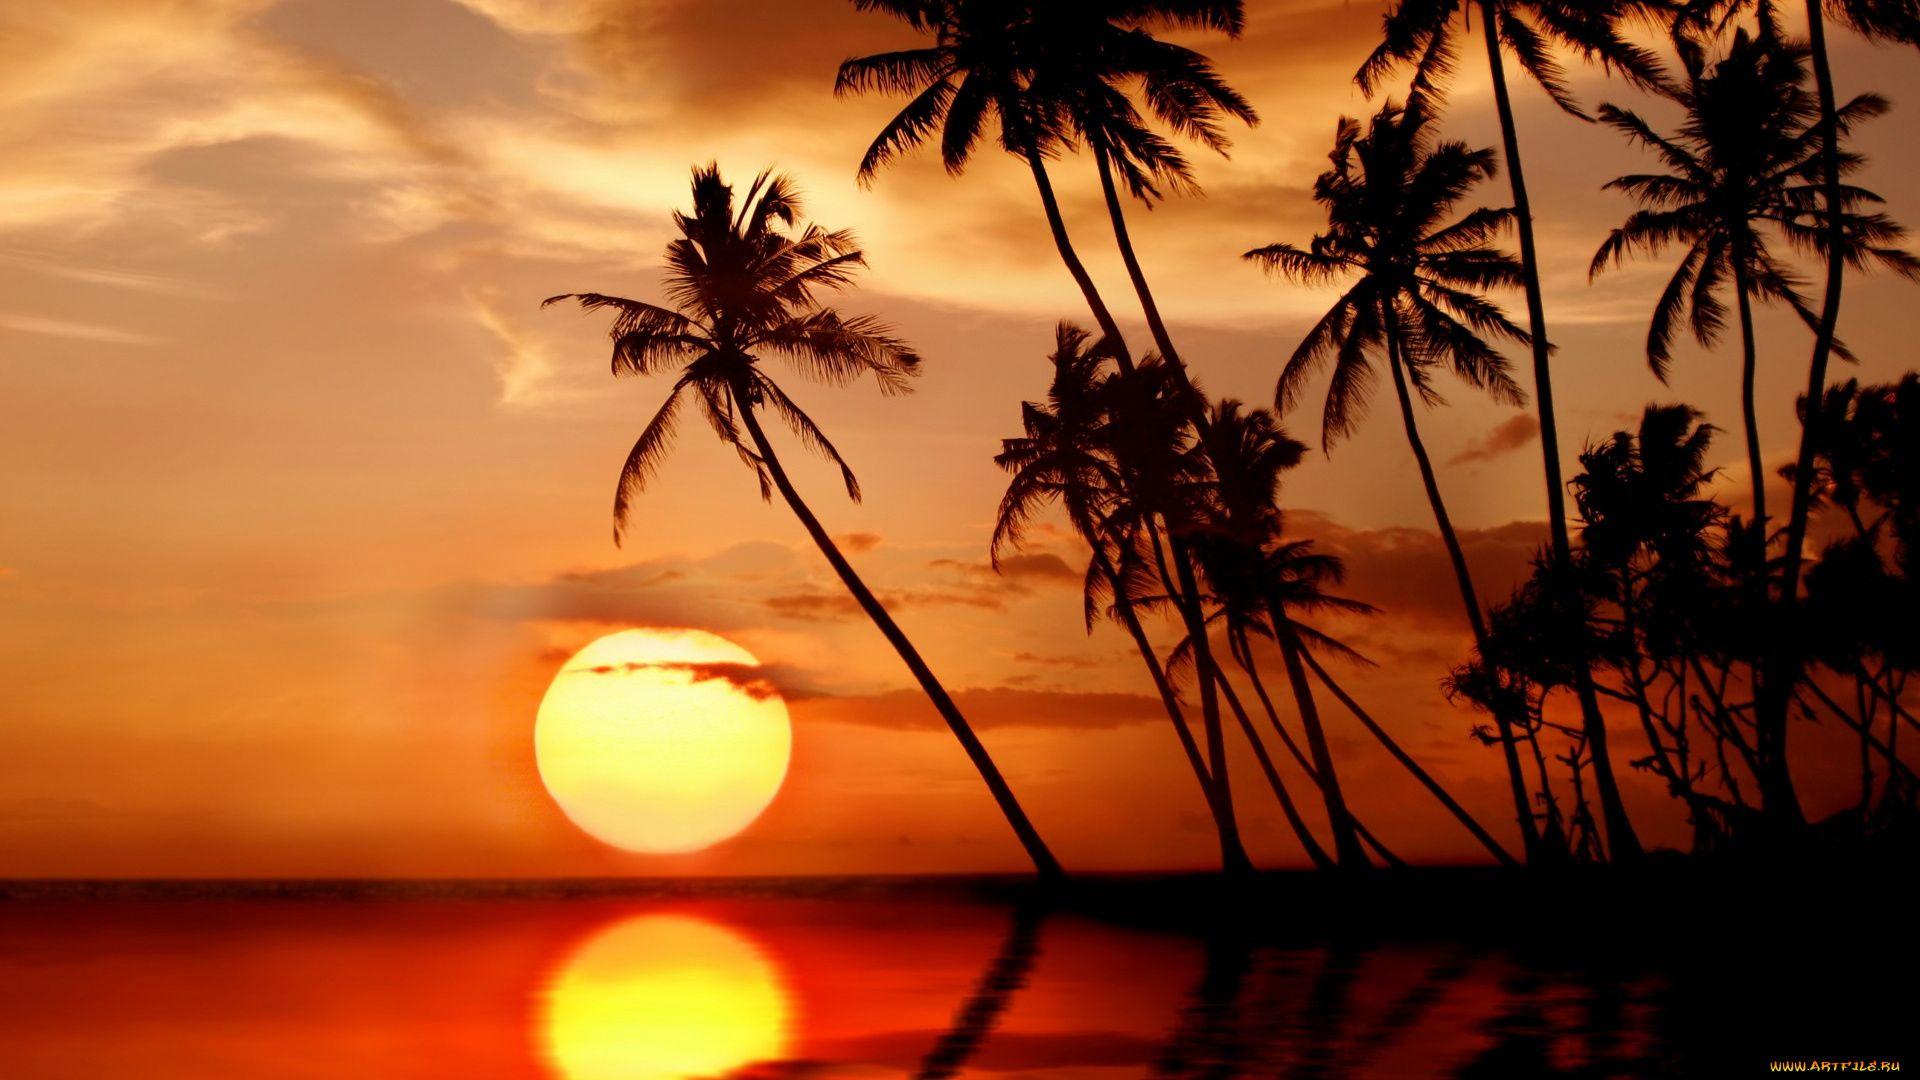 Palm Tree Sunset desktop background